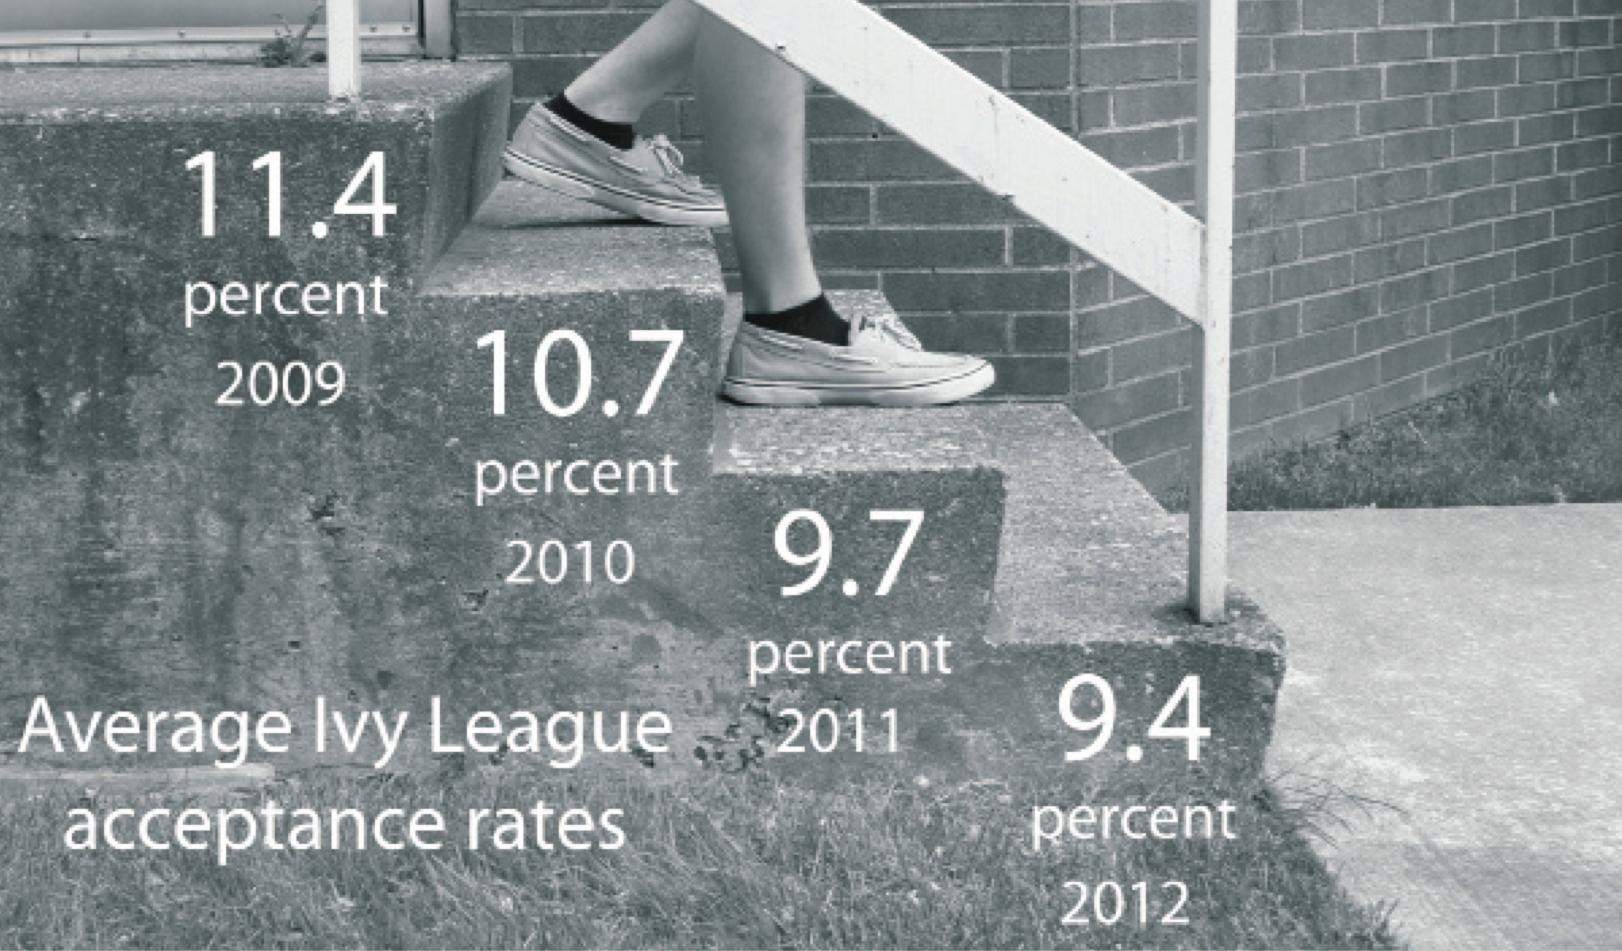 average-acceptance-rates